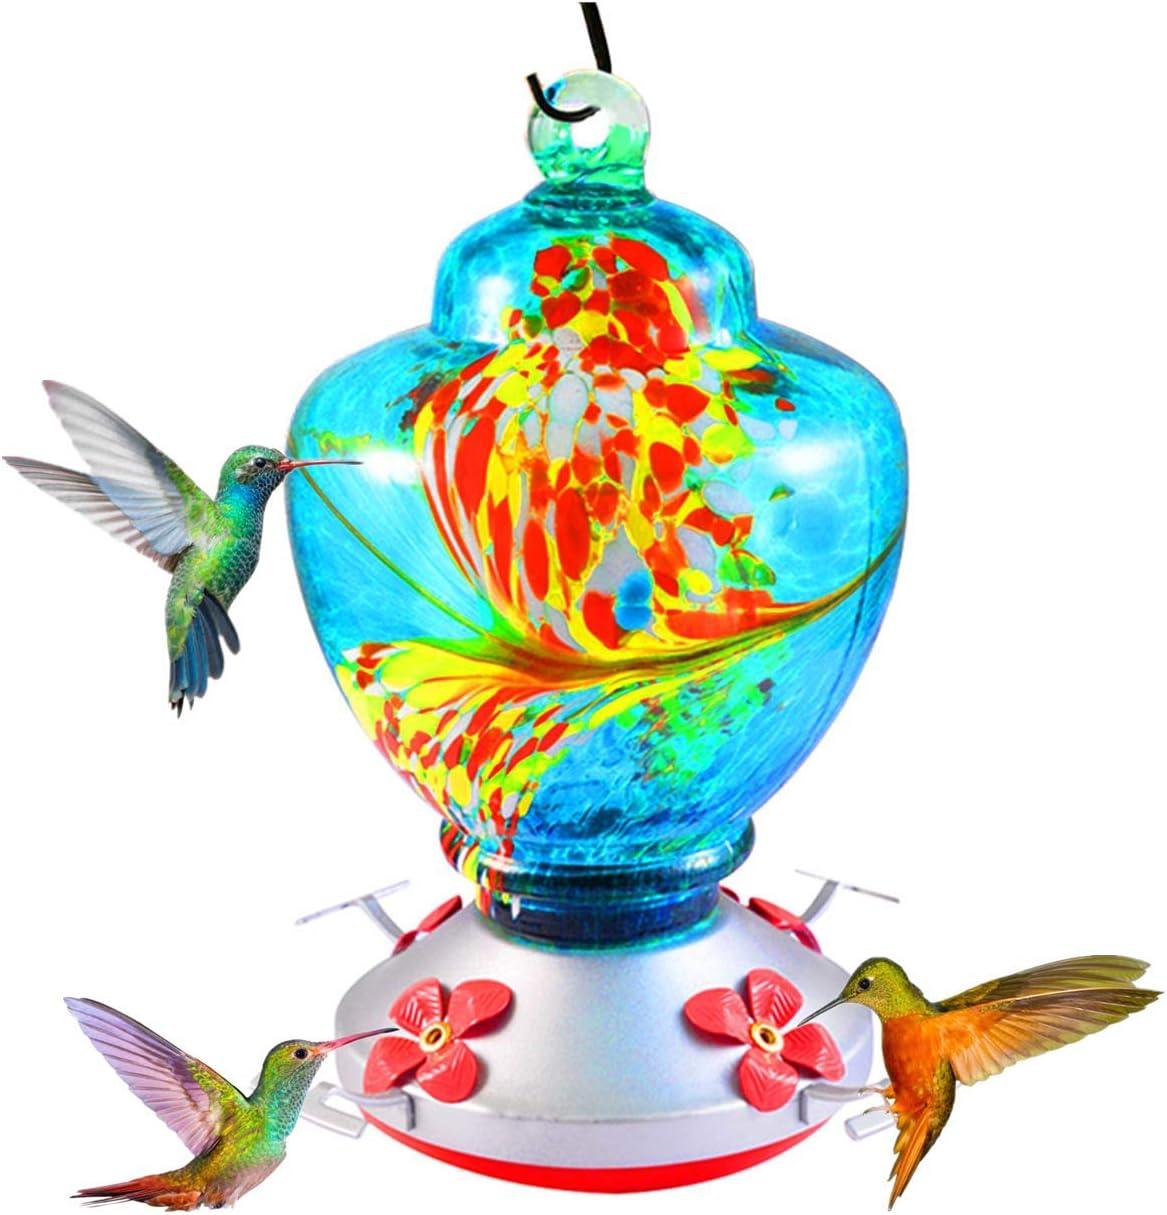 AIPET Hummingbird Feederfor Outdoor 38 Fluid OuncesBlown Glass Hummingbird Feeders Nectar CapacityInclude Ant Moat, Metal Hook, Hemp Rope, Brush-Blue